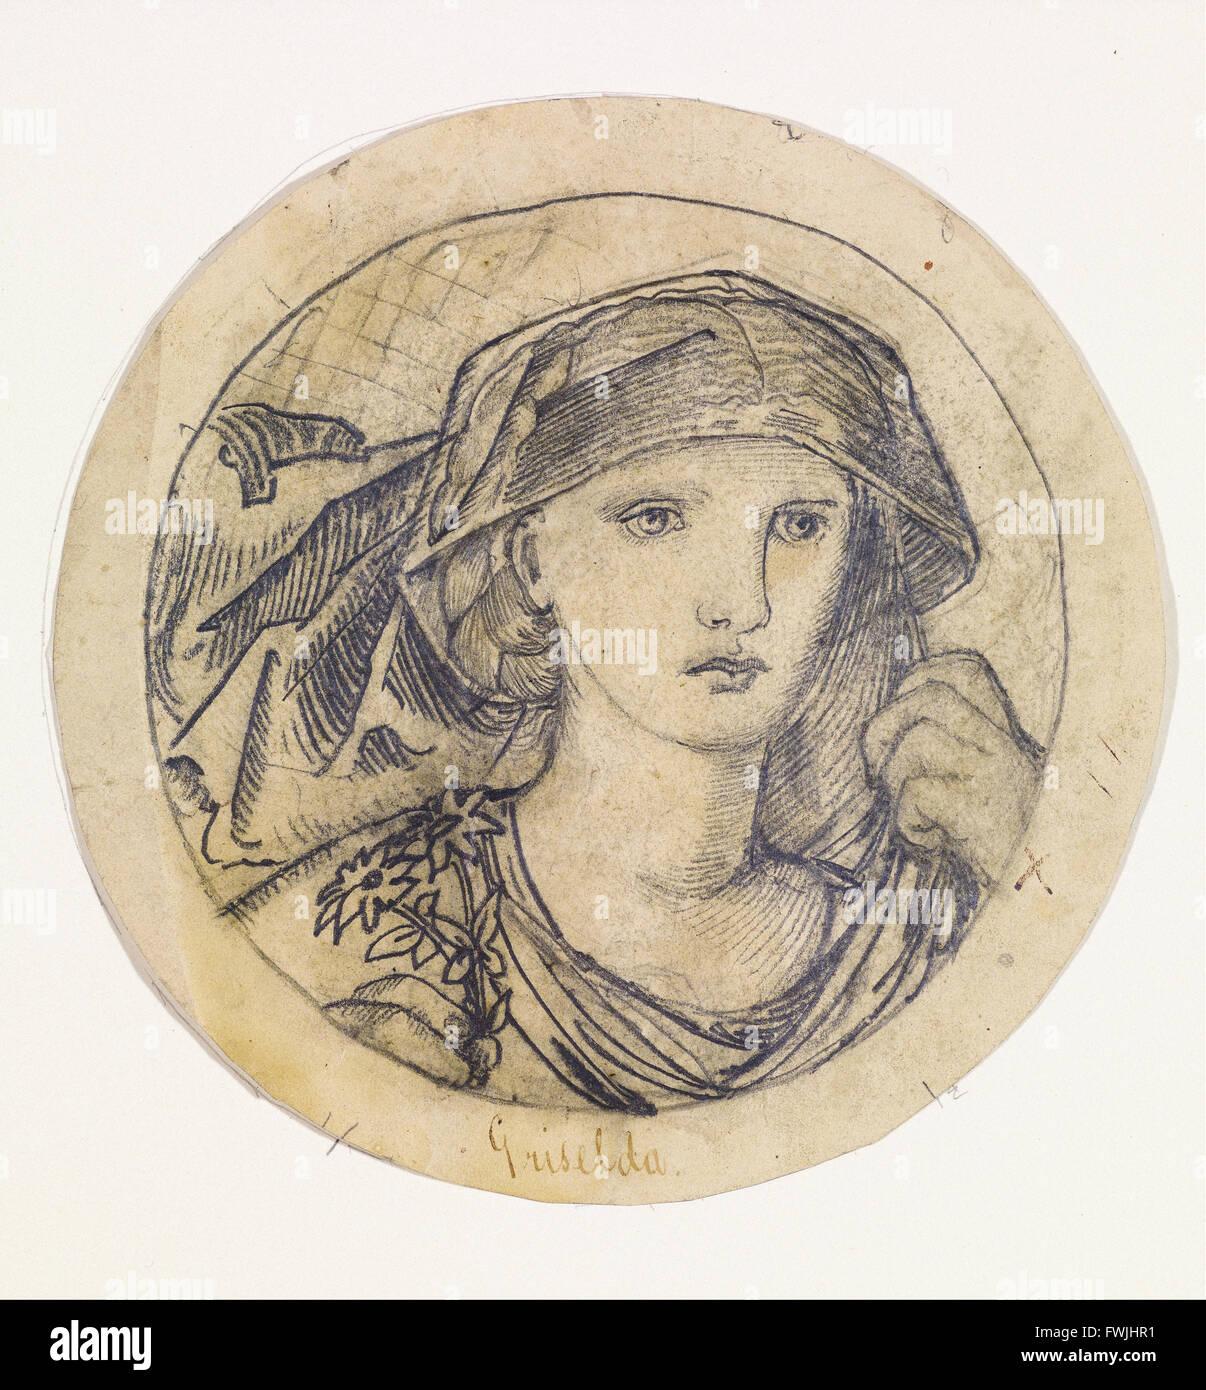 "Edward Burne-Jones - Chaucer ""Legenda di buone donne' - Griselda - Birmingham Museum & Art Gallery Immagini Stock"